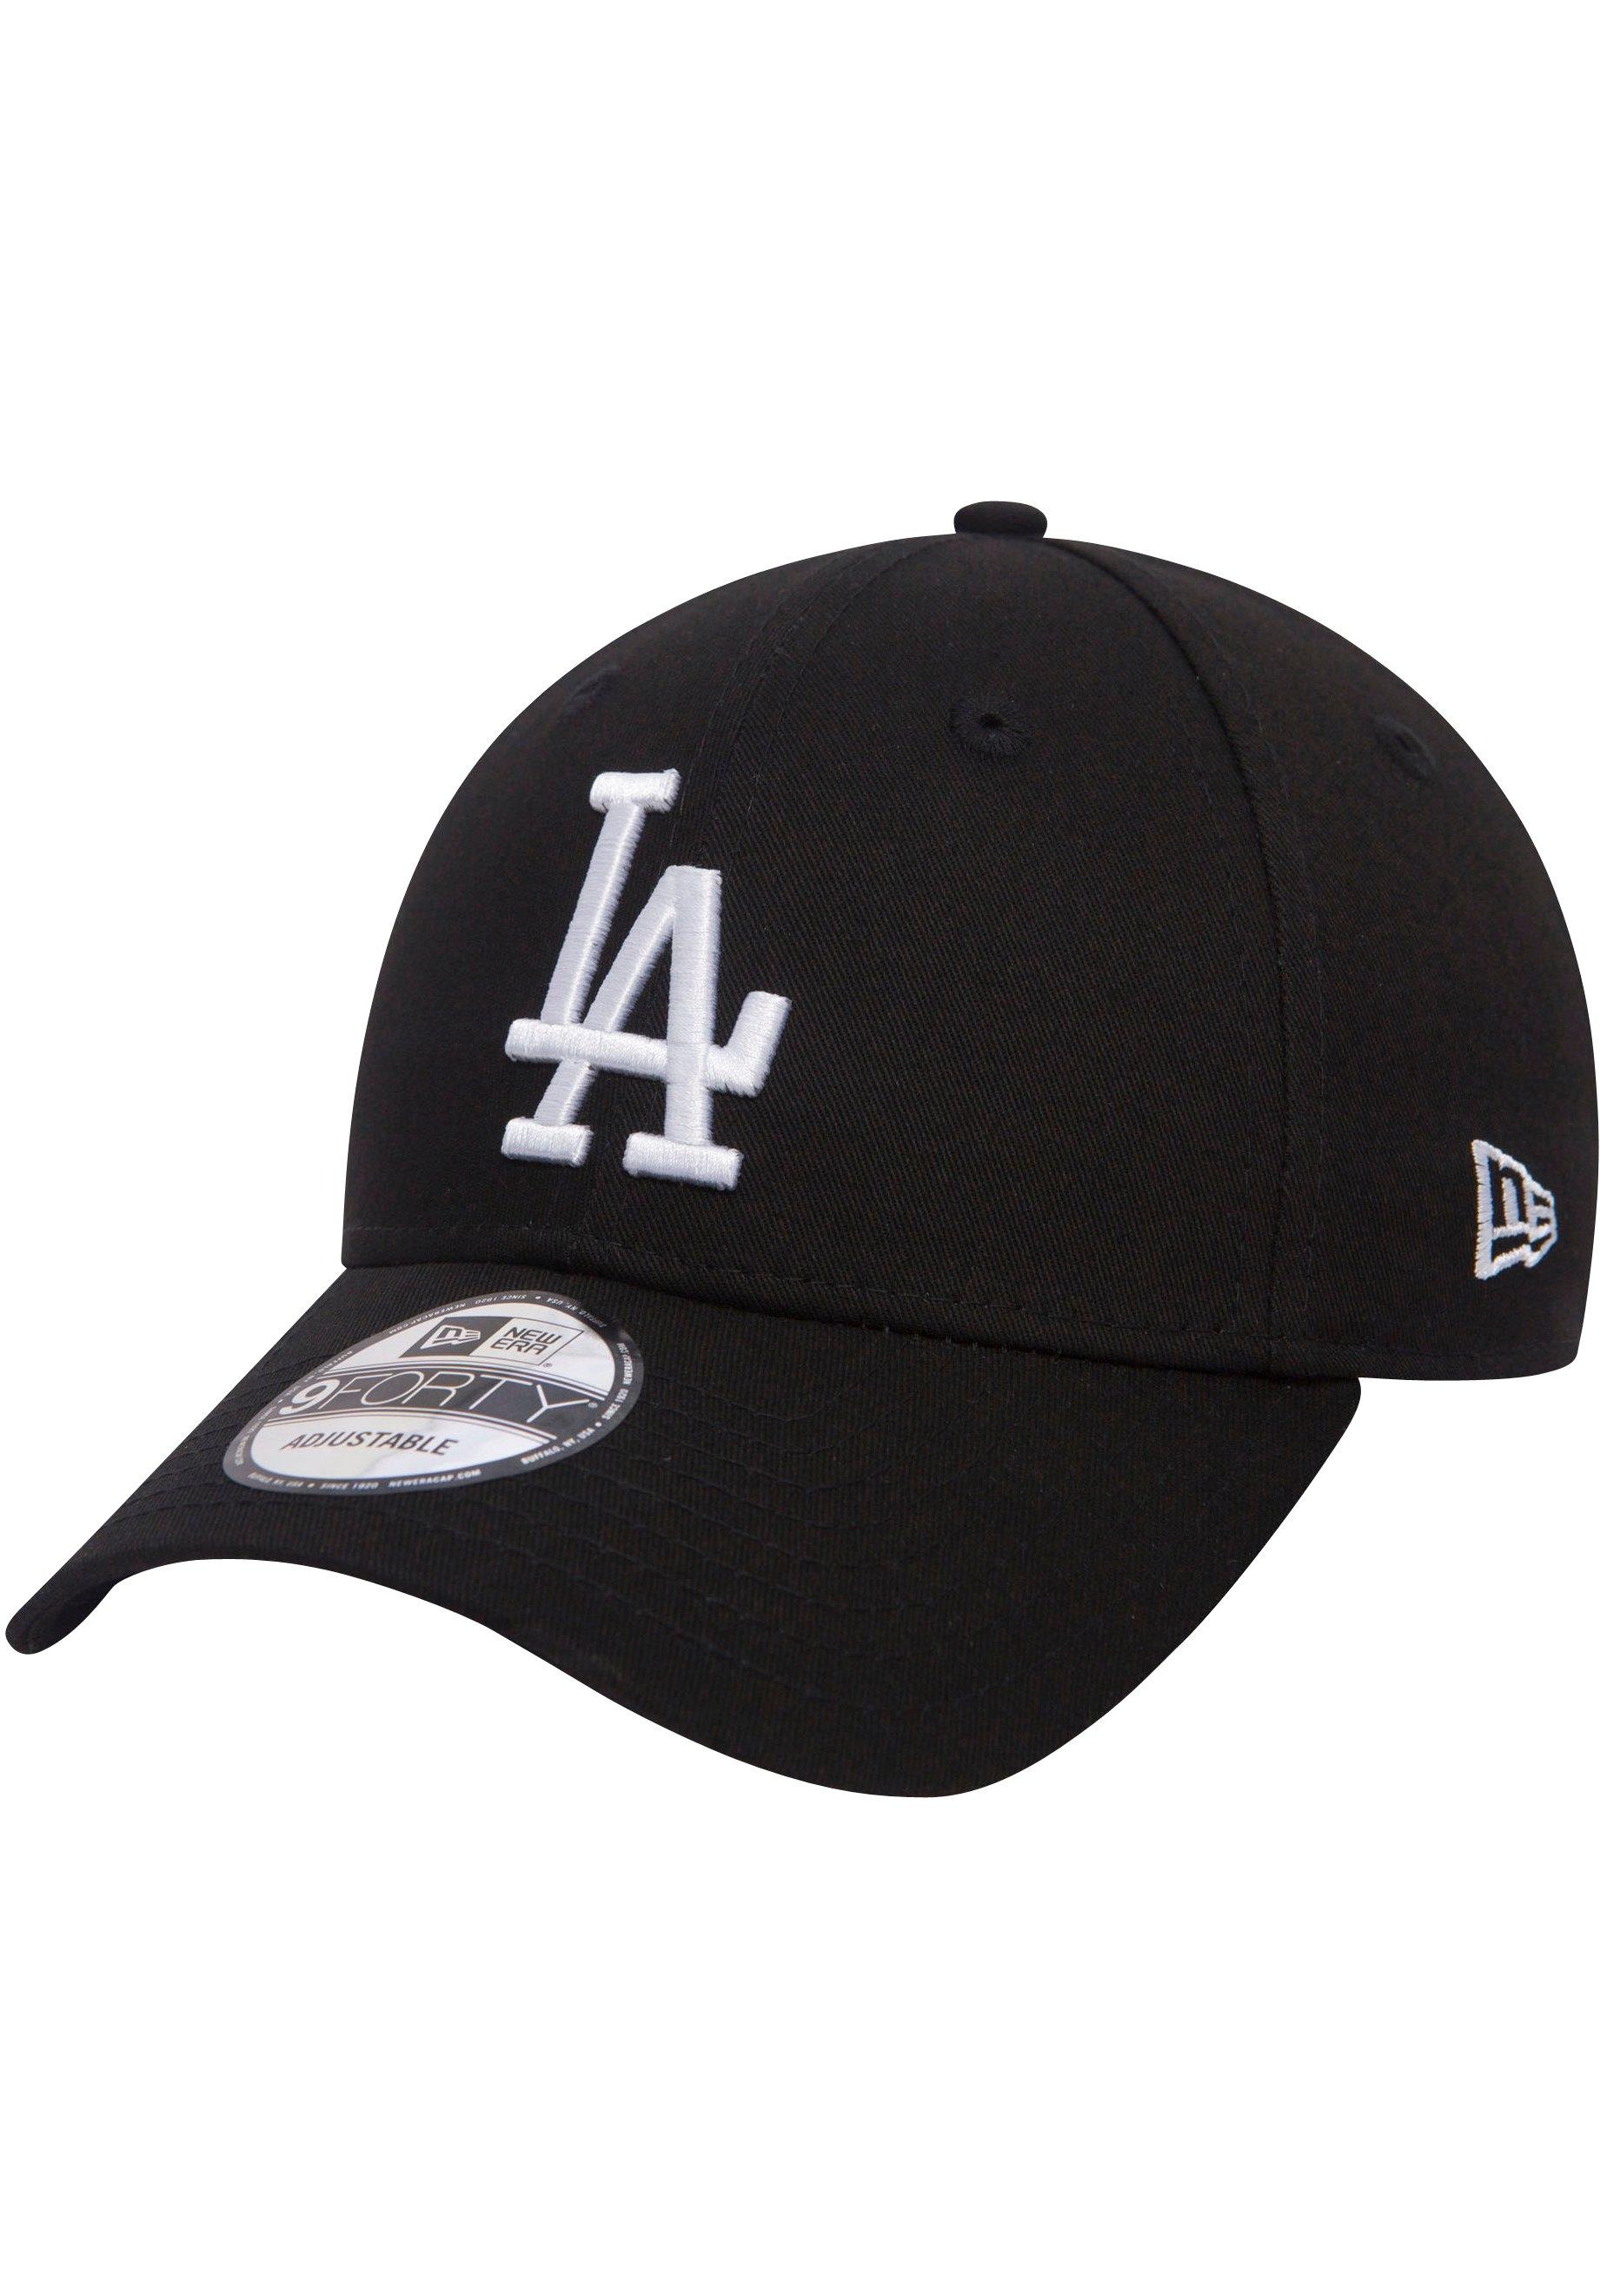 New Era baseballcap »LOS ANGELES DODGERS« online kopen op otto.nl